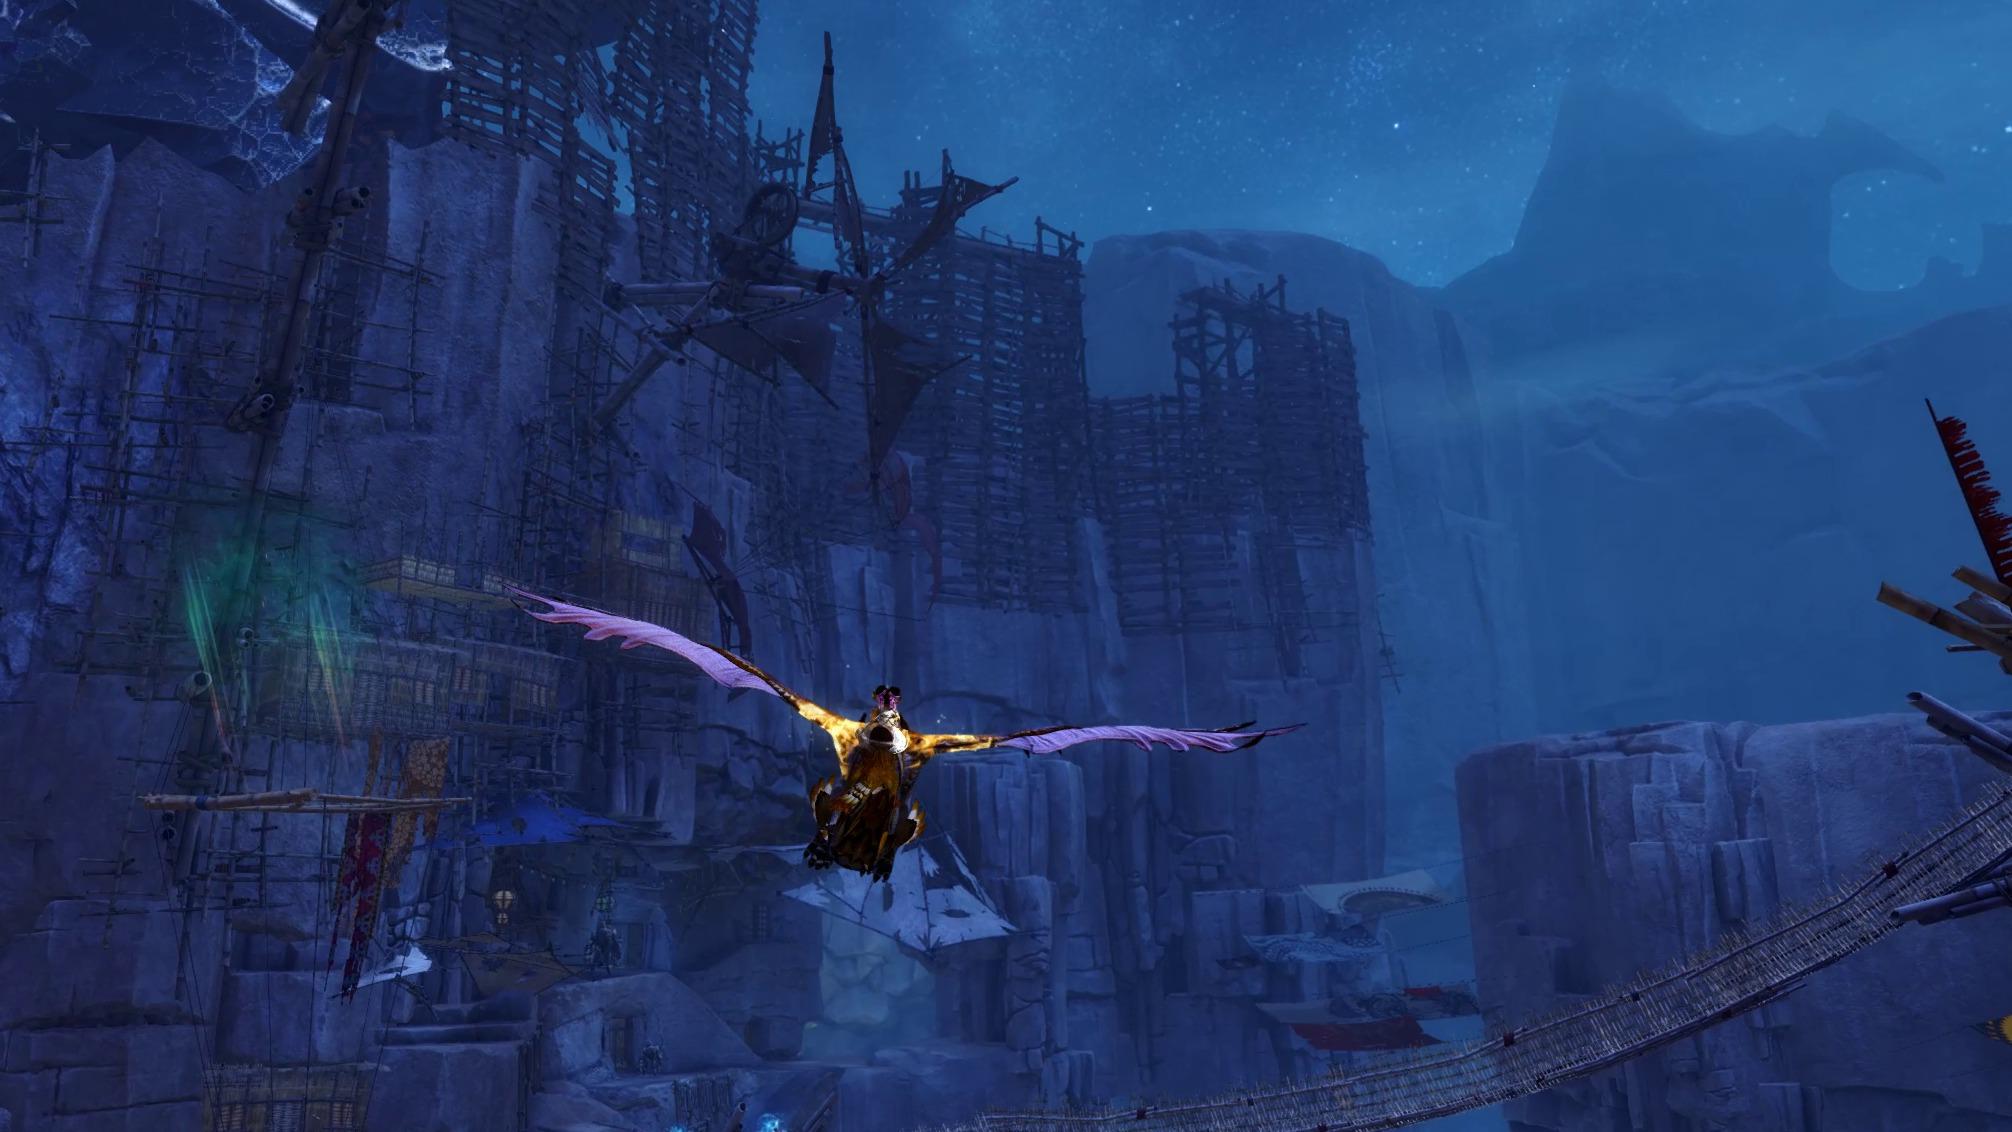 A Griffon, soaring